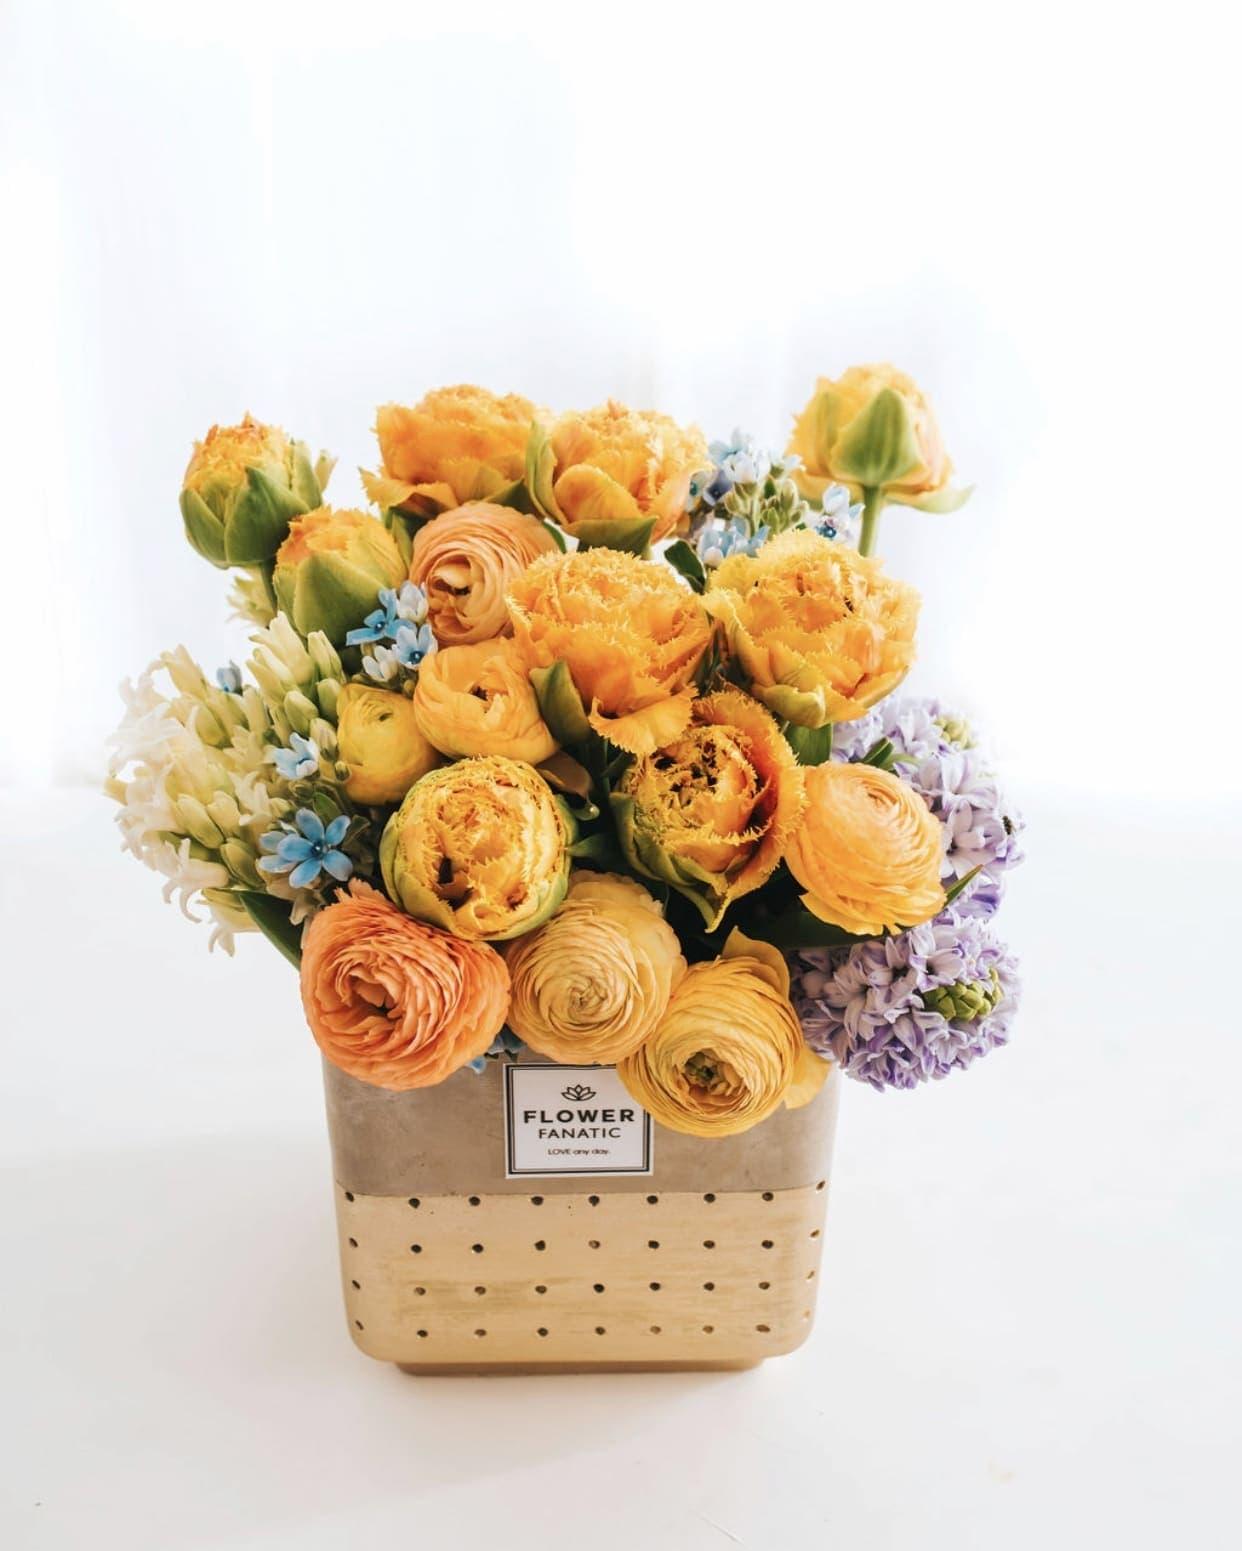 You Make Me Shine In Doral Fl Flower Fanatic